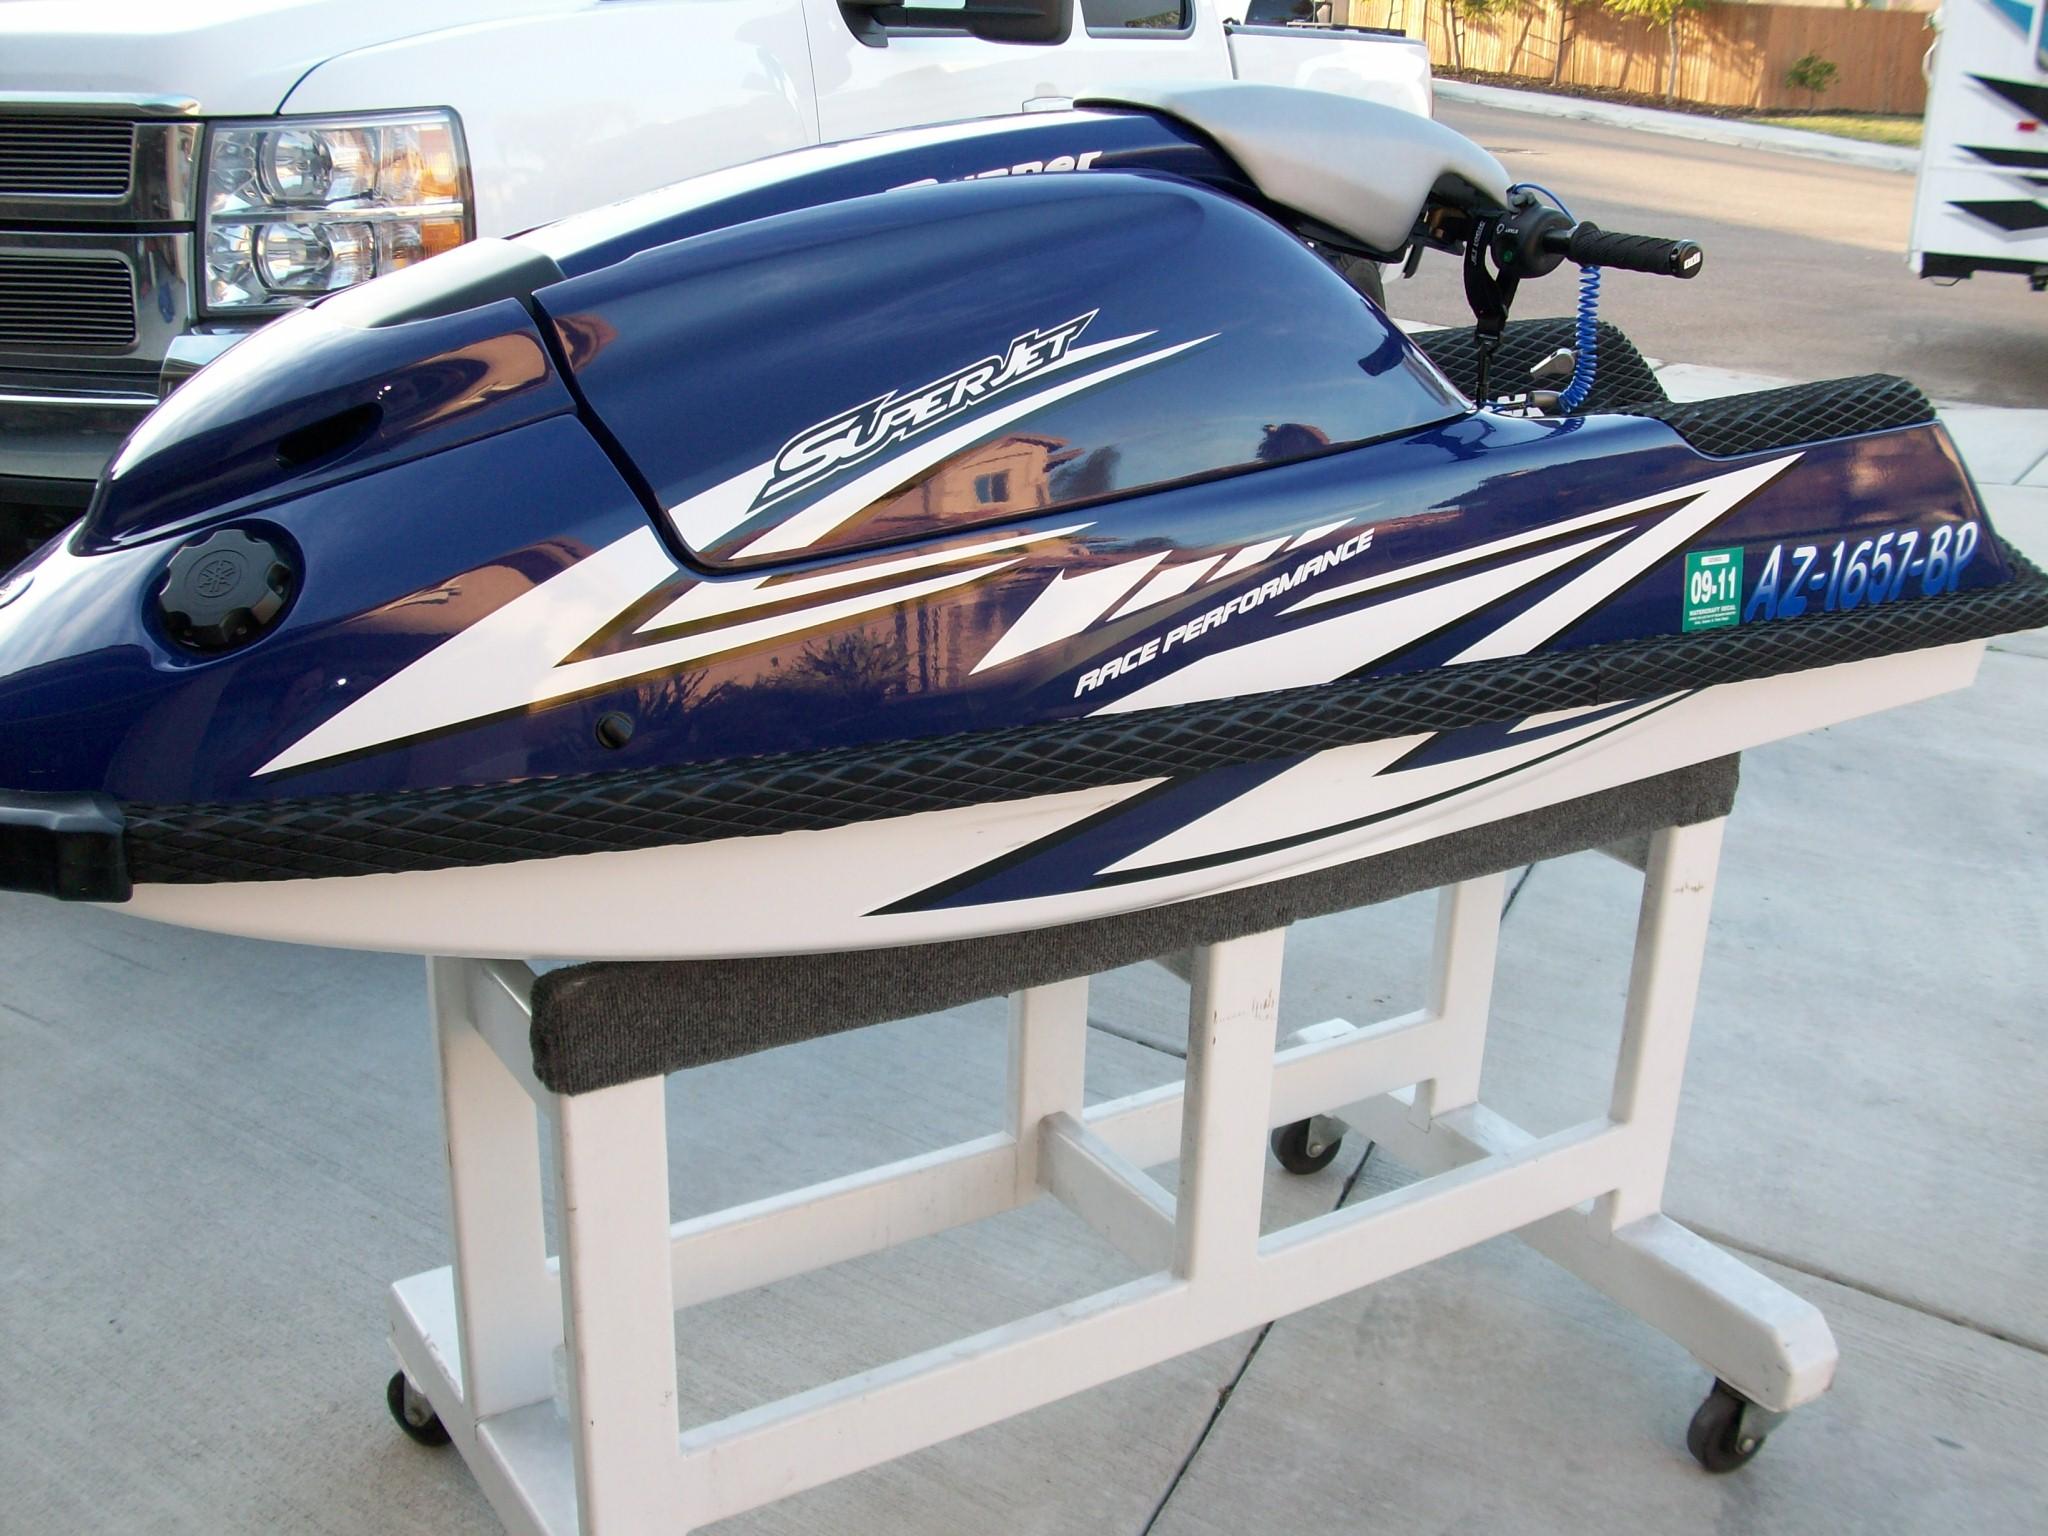 F/S 09 Yamaha superjet-100_0492.jpg